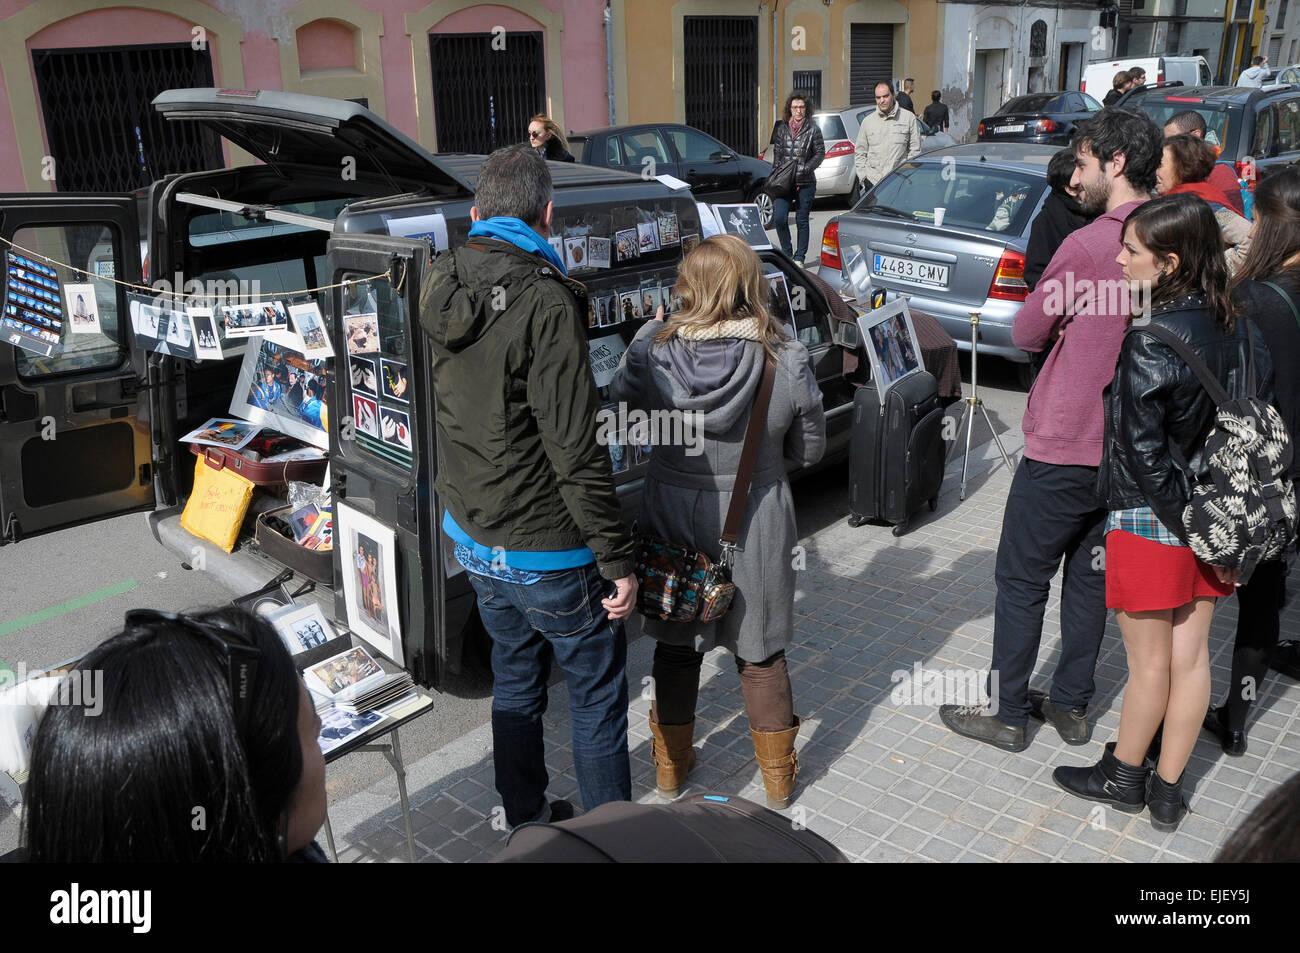 Oscar Elias y Rosmi Duaso exposición durante un día, junto al mercado de alto PAO en Poble Nou Barcelona Imagen De Stock